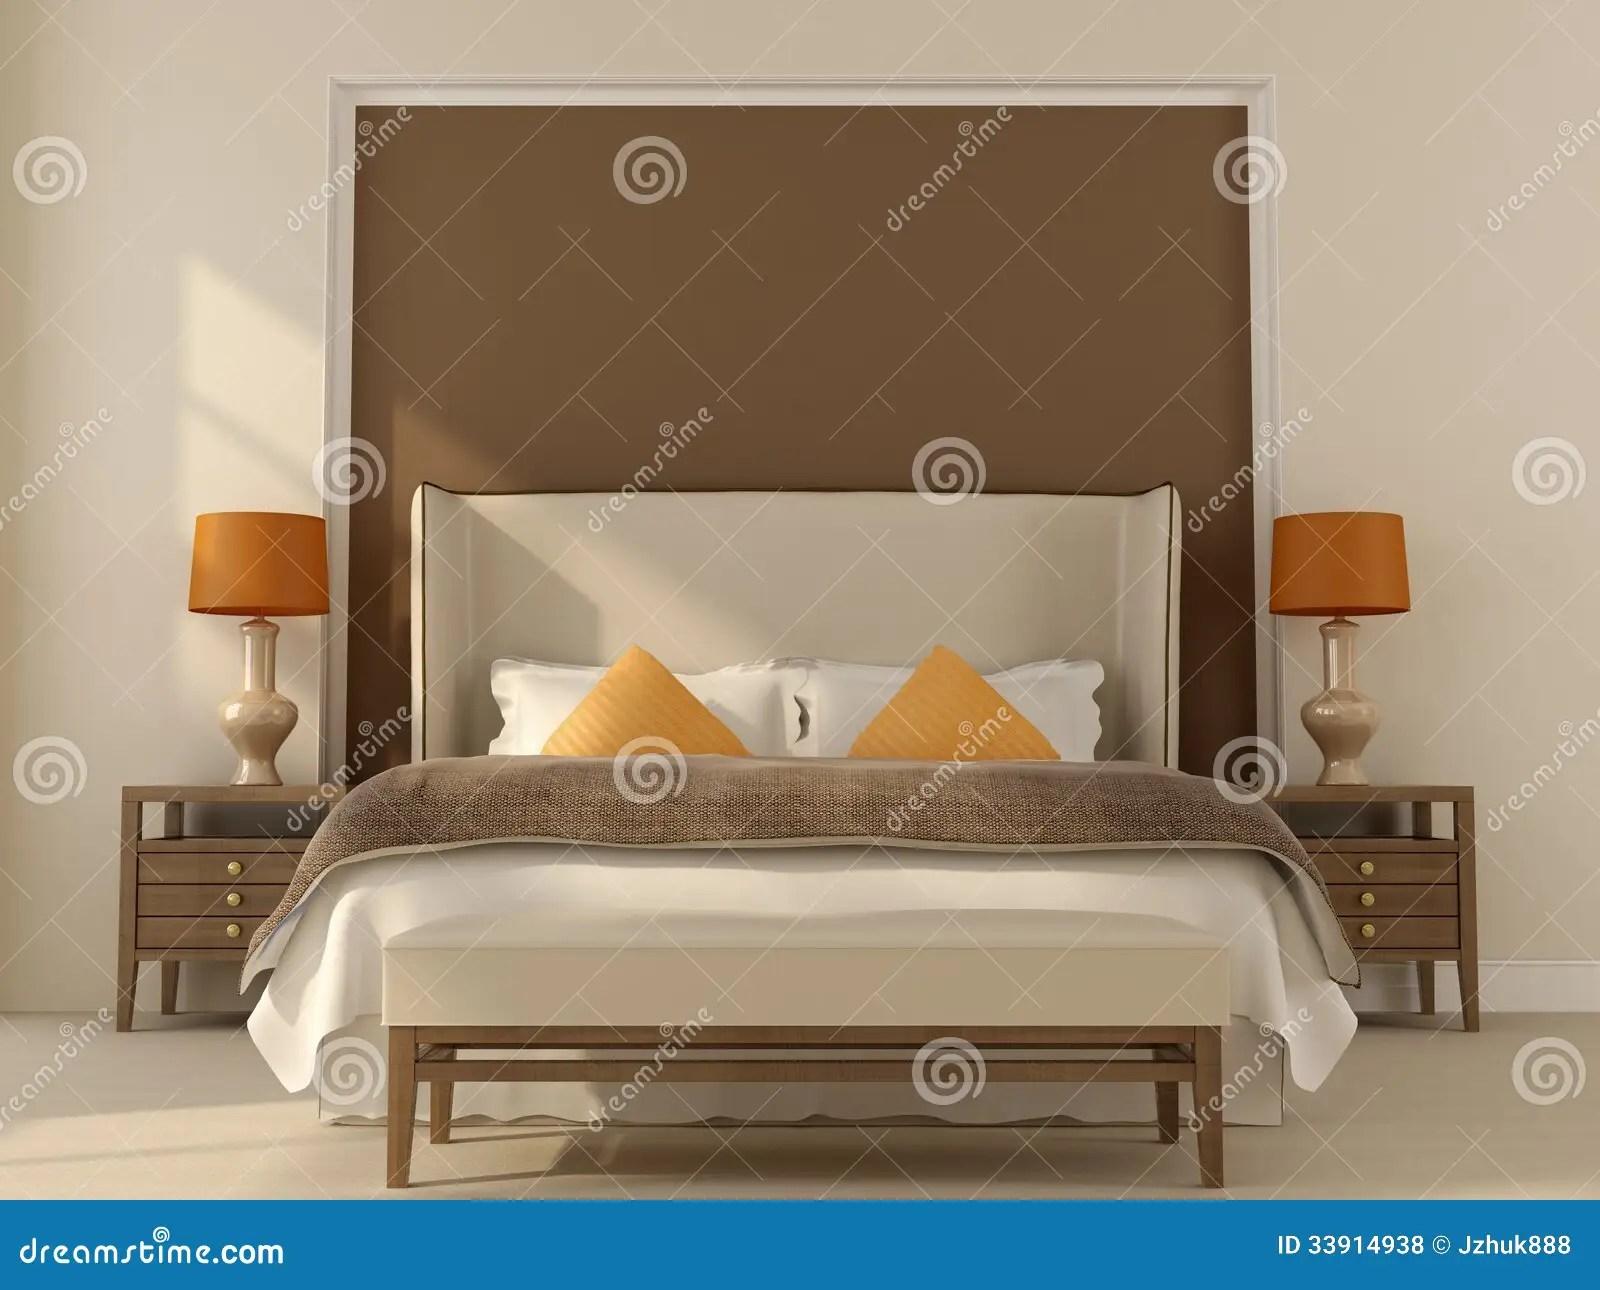 Camera Da Letto Beige : Camera da letto beige e blu camera da letto beige con la